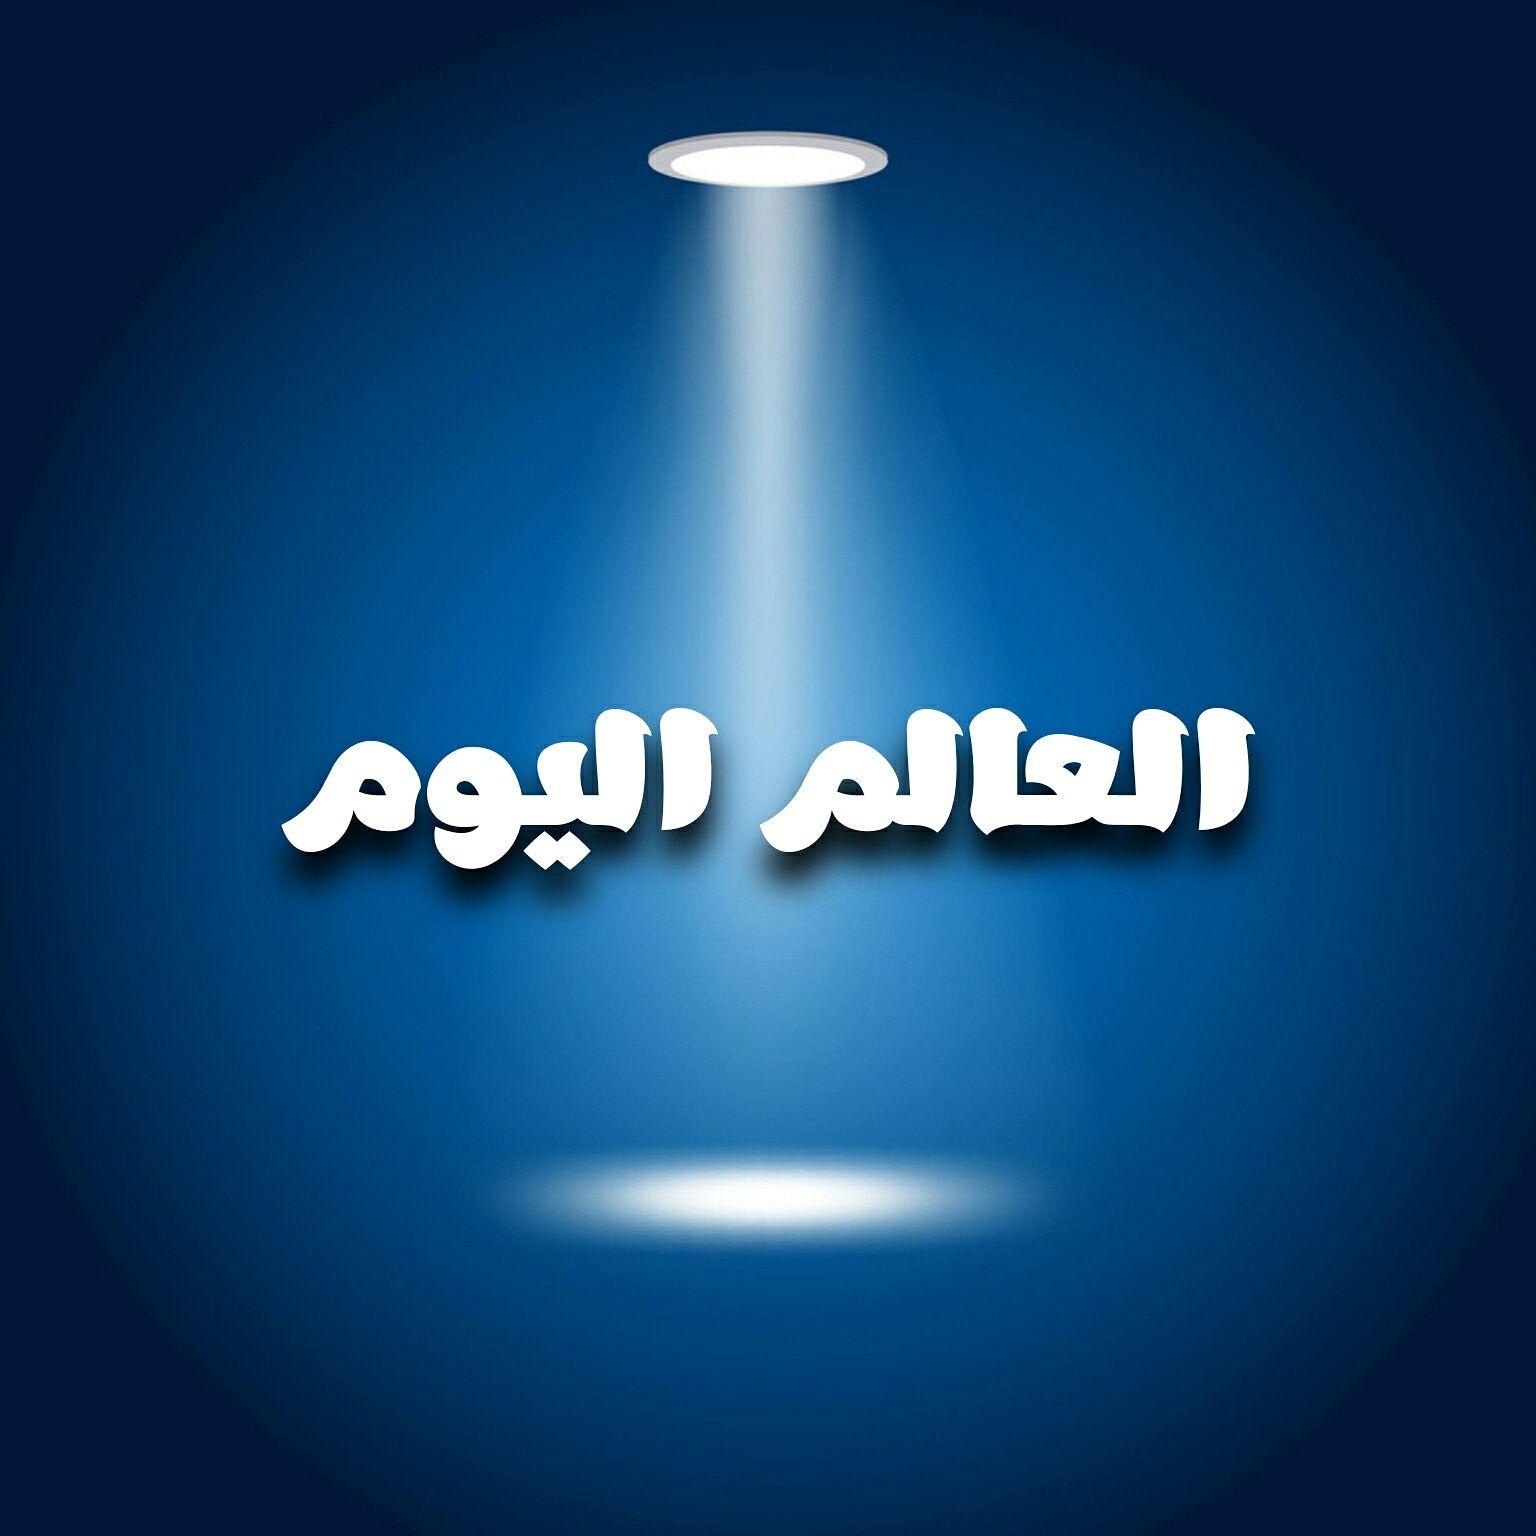 Pin By Omayma Sherif On العالم اليوم Lockscreen Screenshot Lockscreen Screenshots